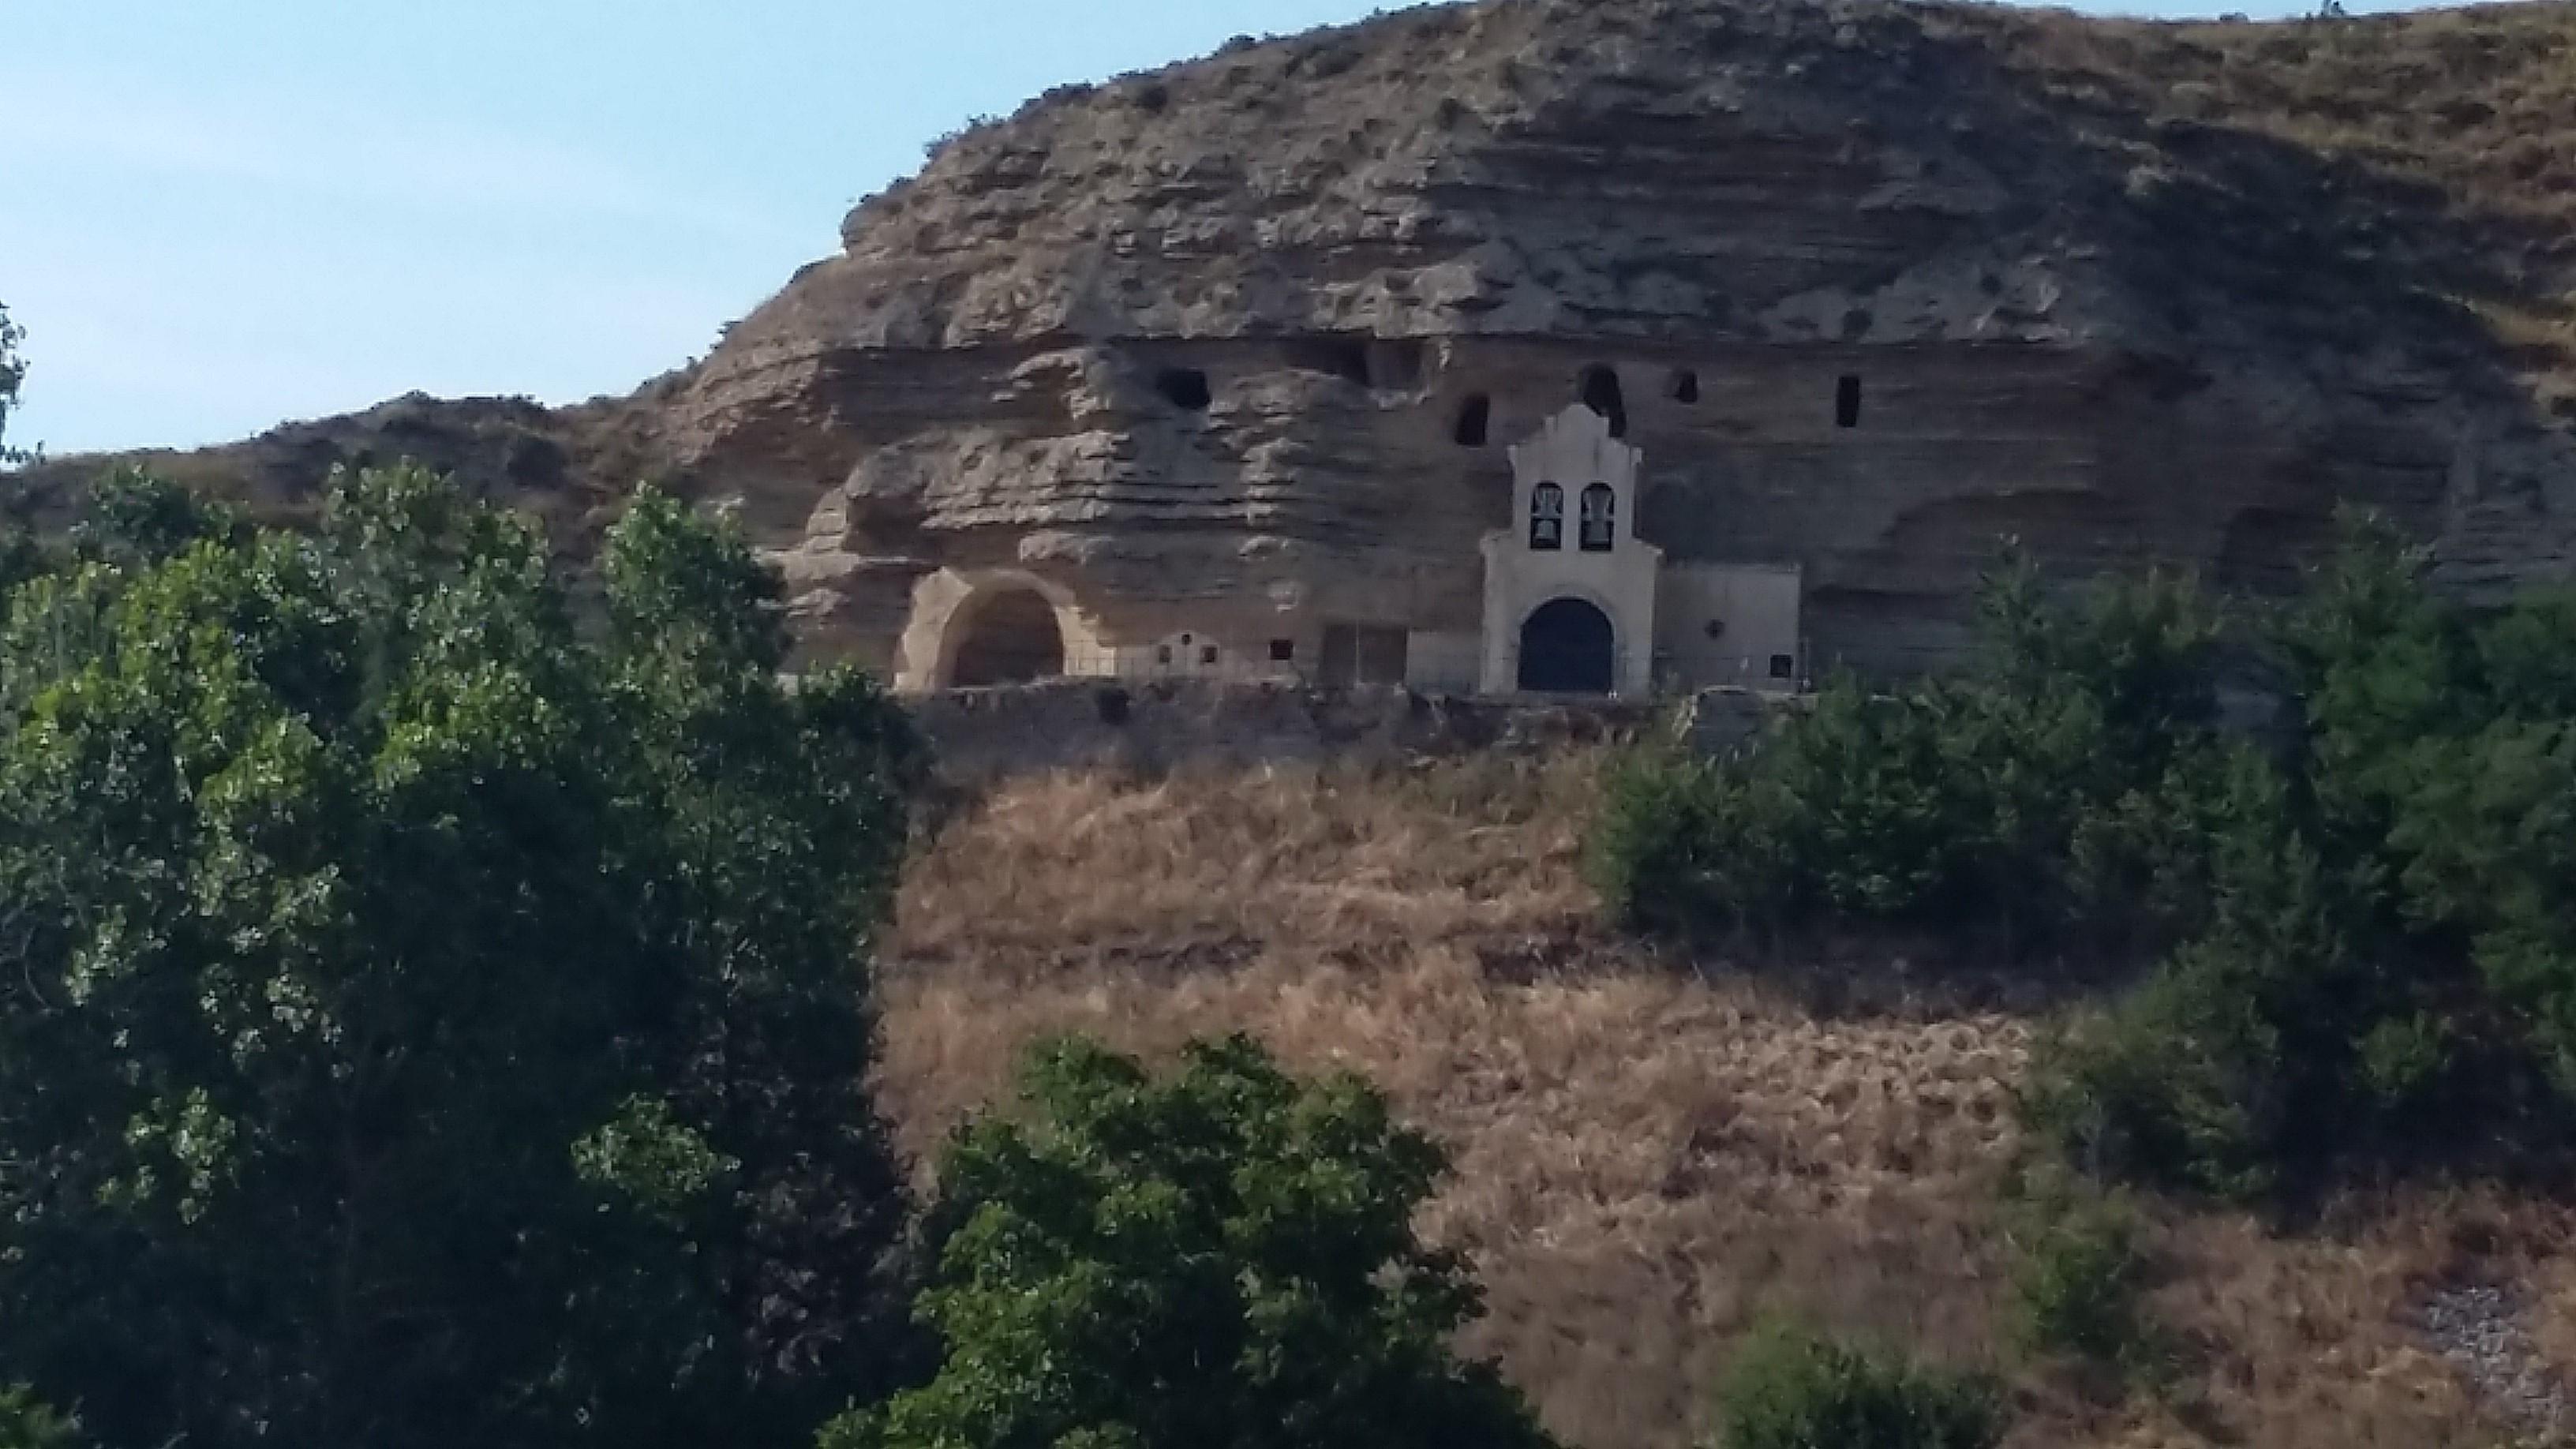 Villafranca Montes de Oca. Szerzetes barlangok és a templomuk a hegyoldalban.